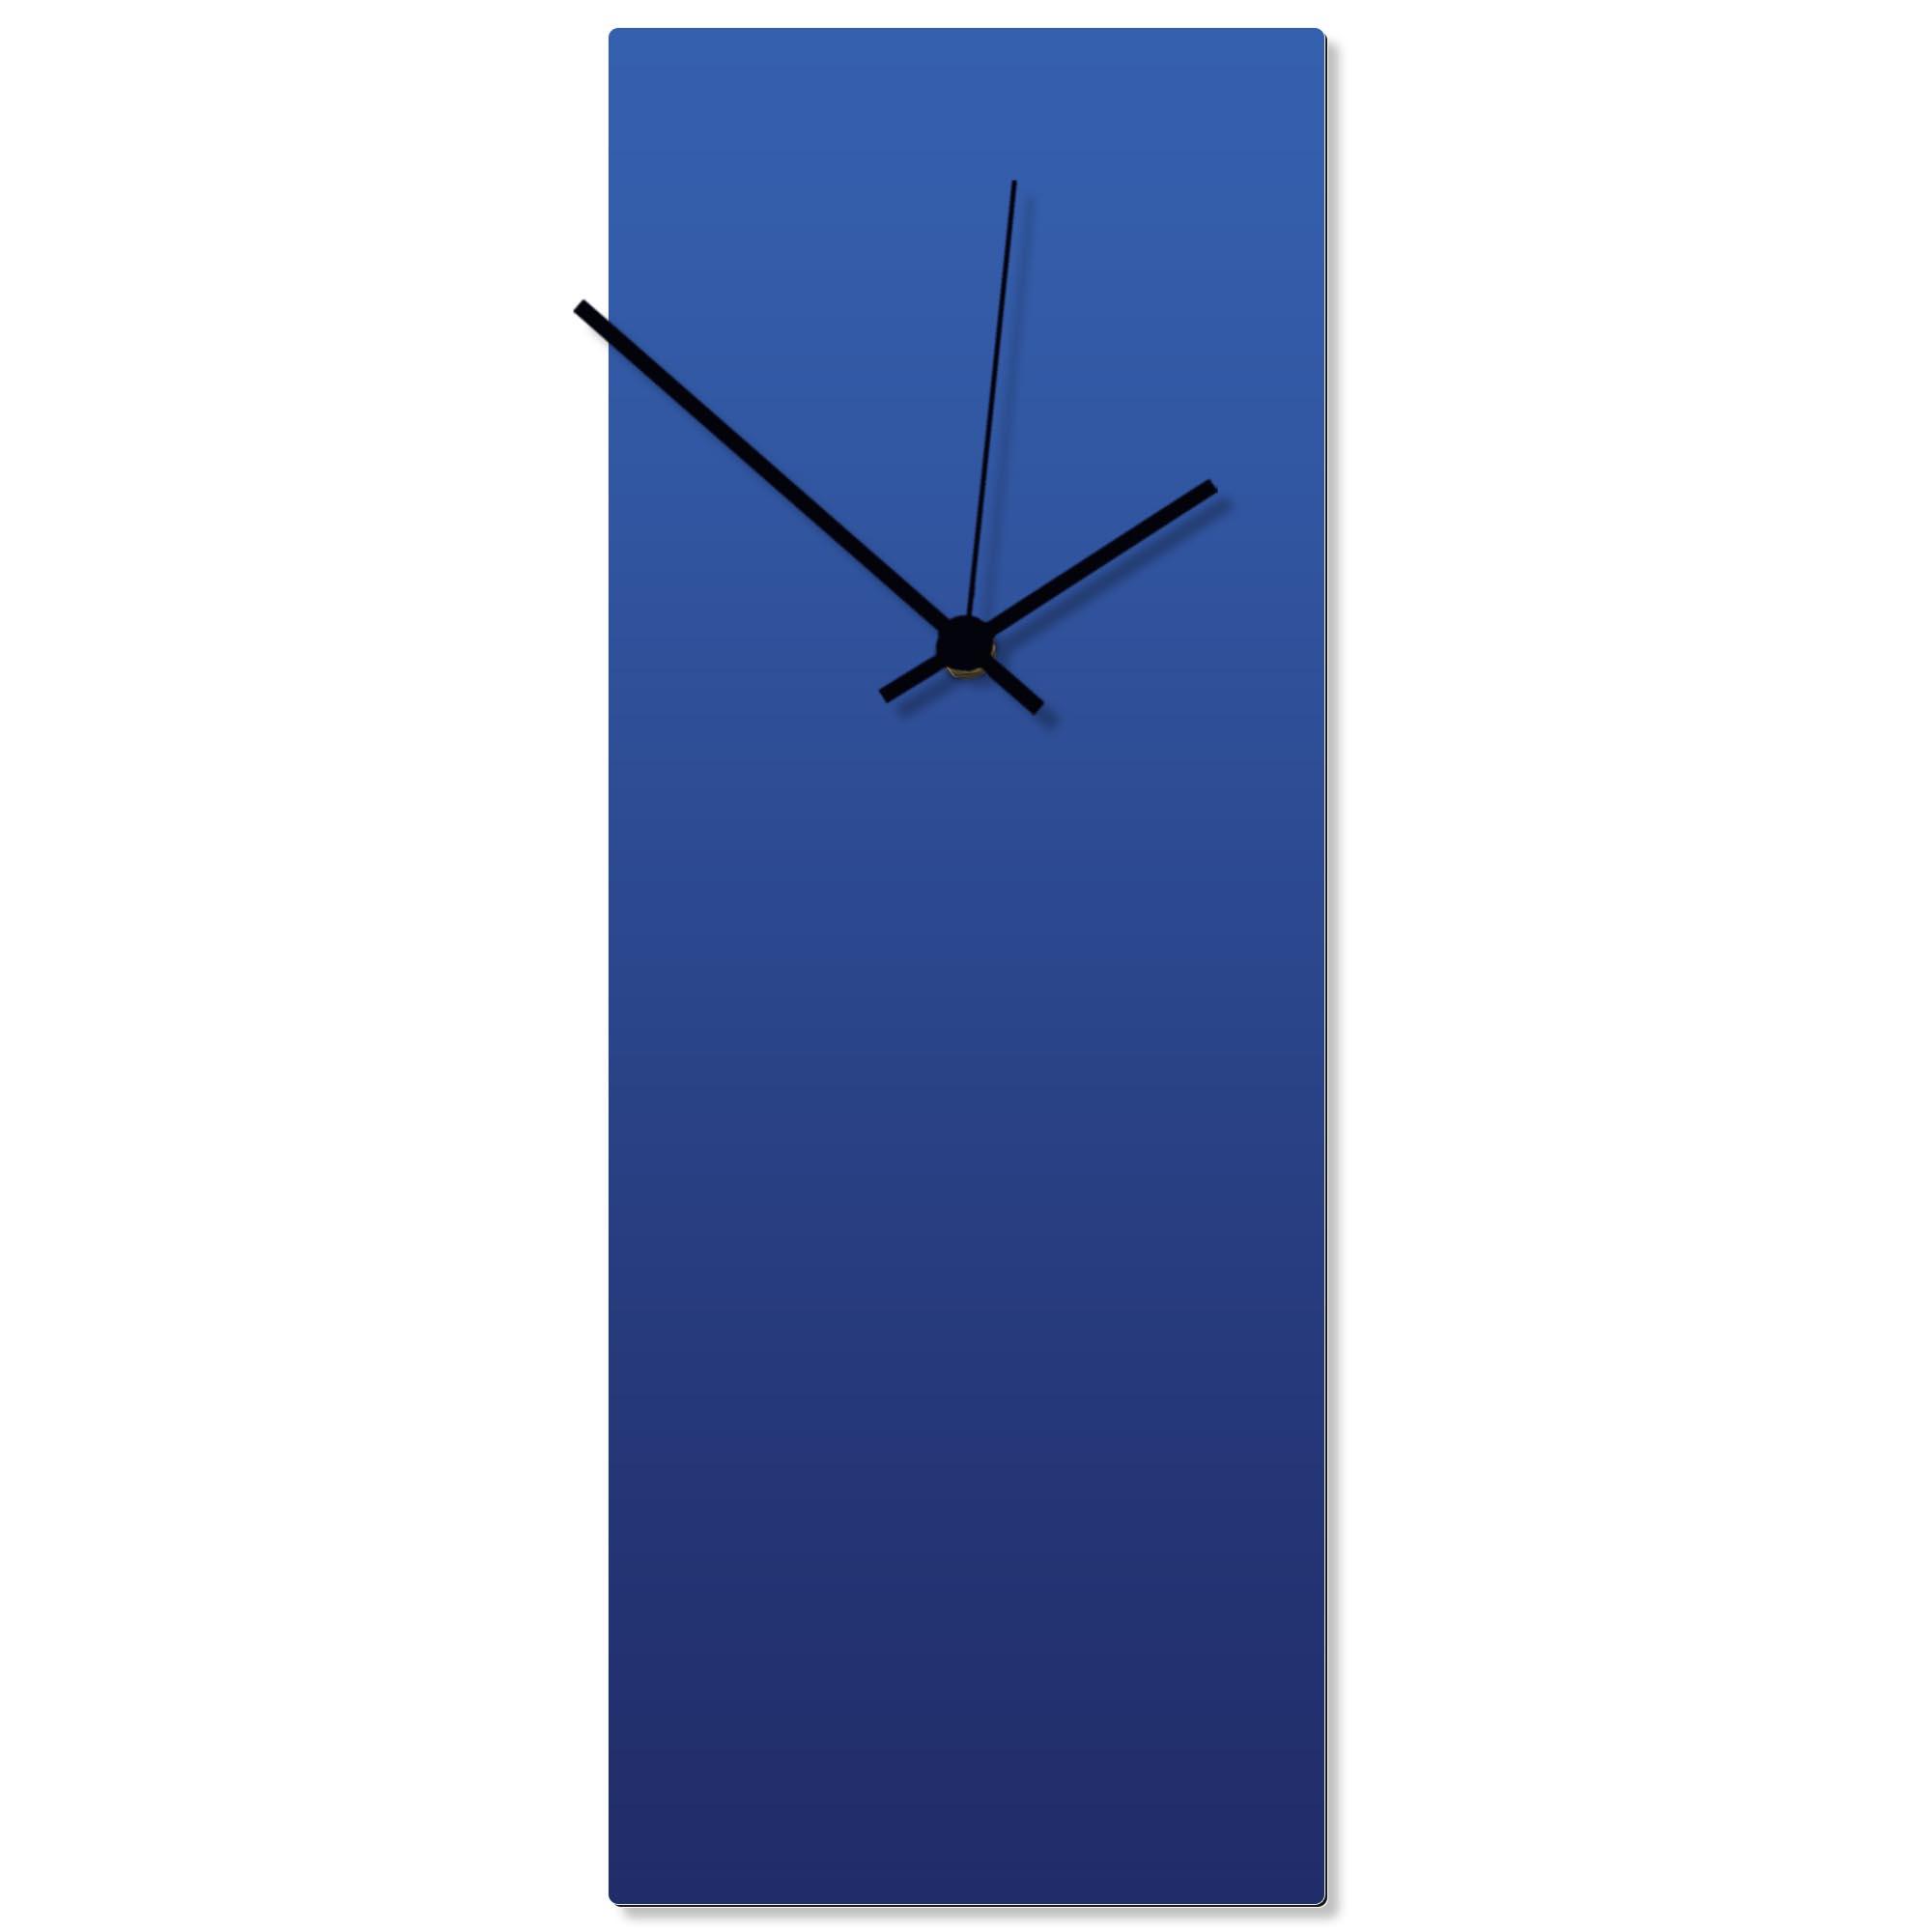 Blueout Black Clock Large 8.25x22in. Aluminum Polymetal